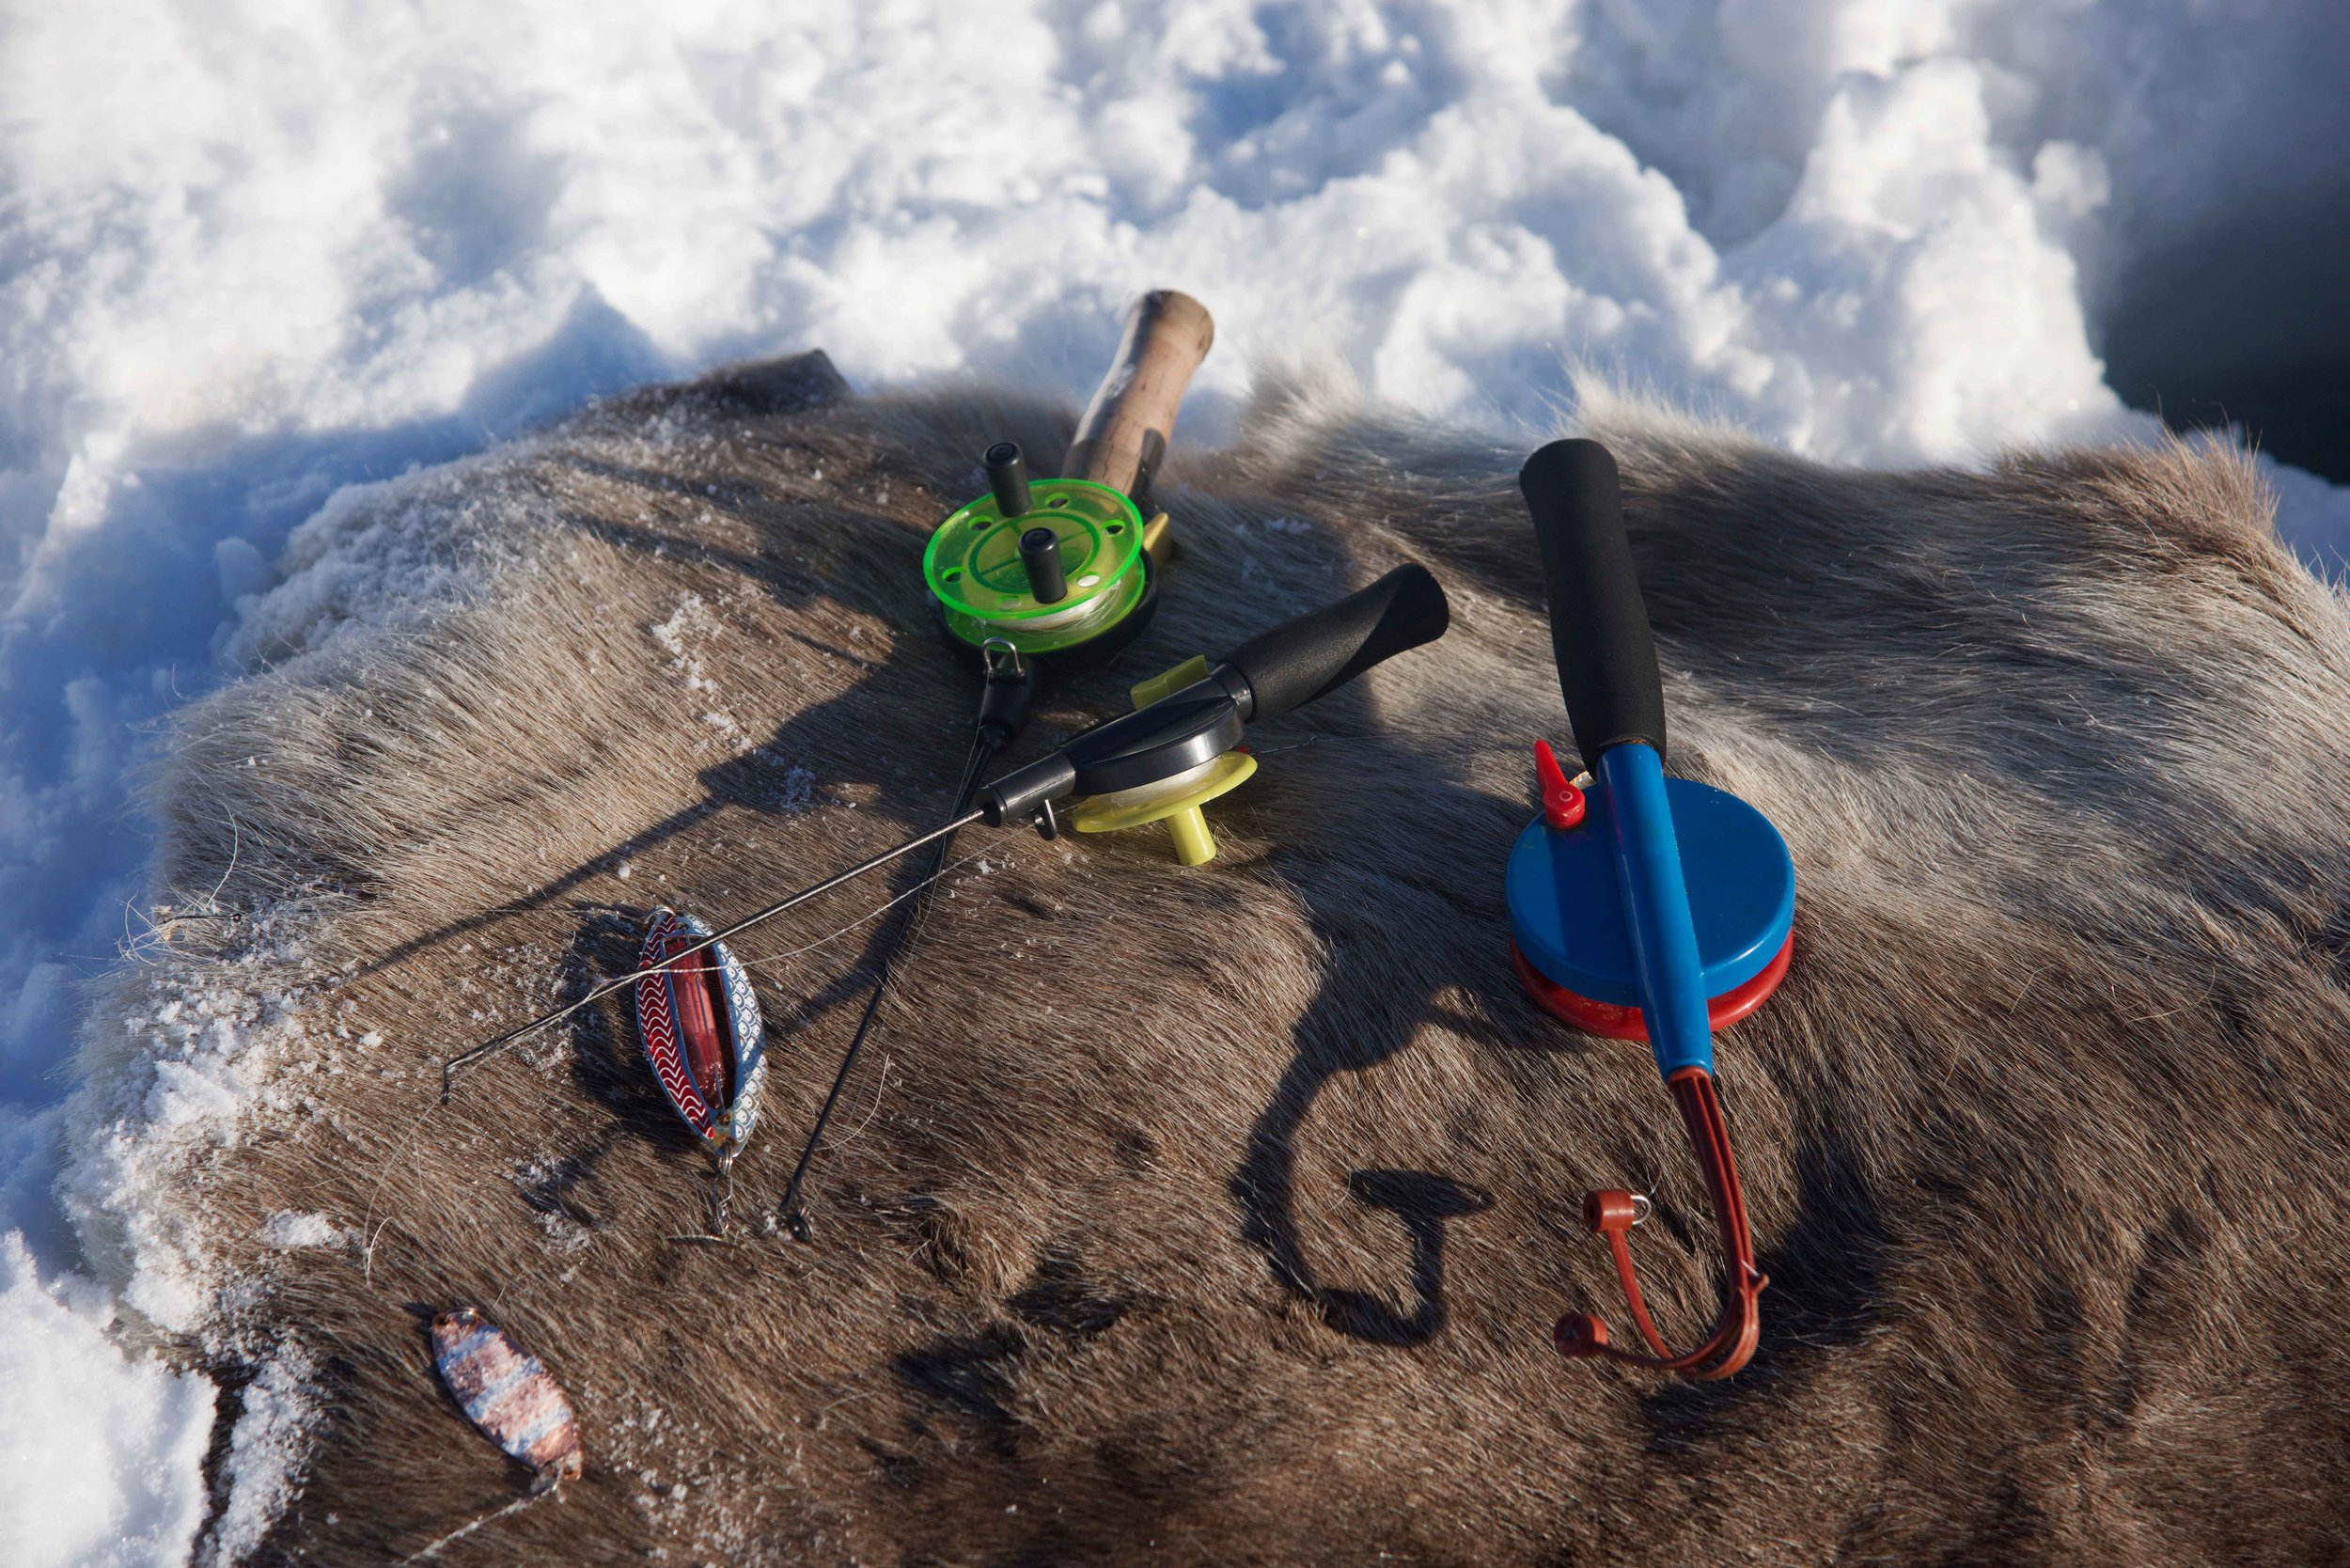 Arctic fishing, high frozen lakes, Arctic Circle, organized by Lyngen Lodge, Norway. Image©thingstodot.com